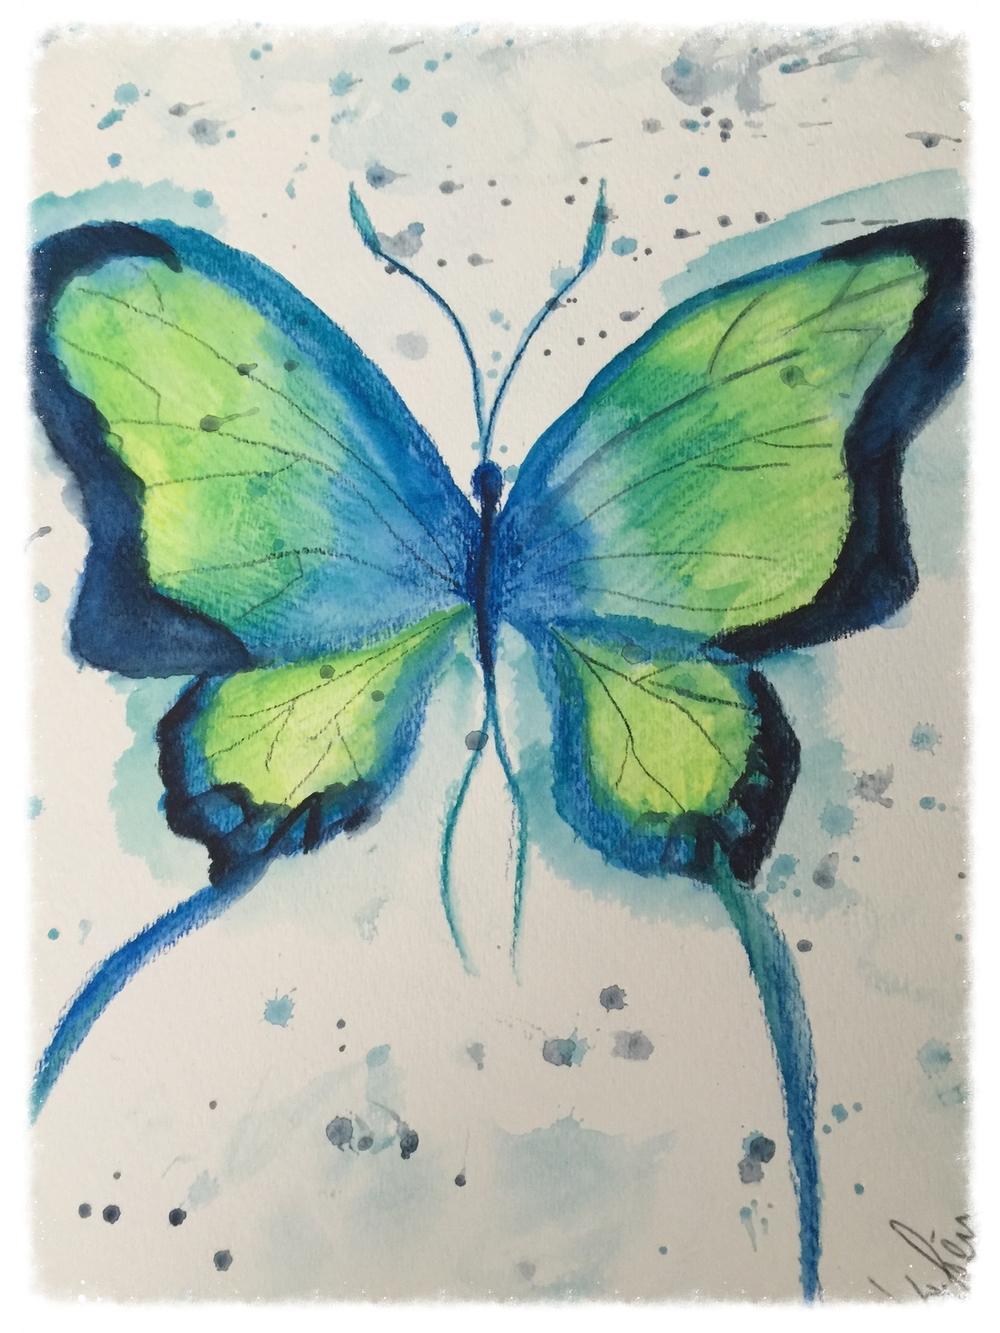 Aqua Butterfly by mama kat